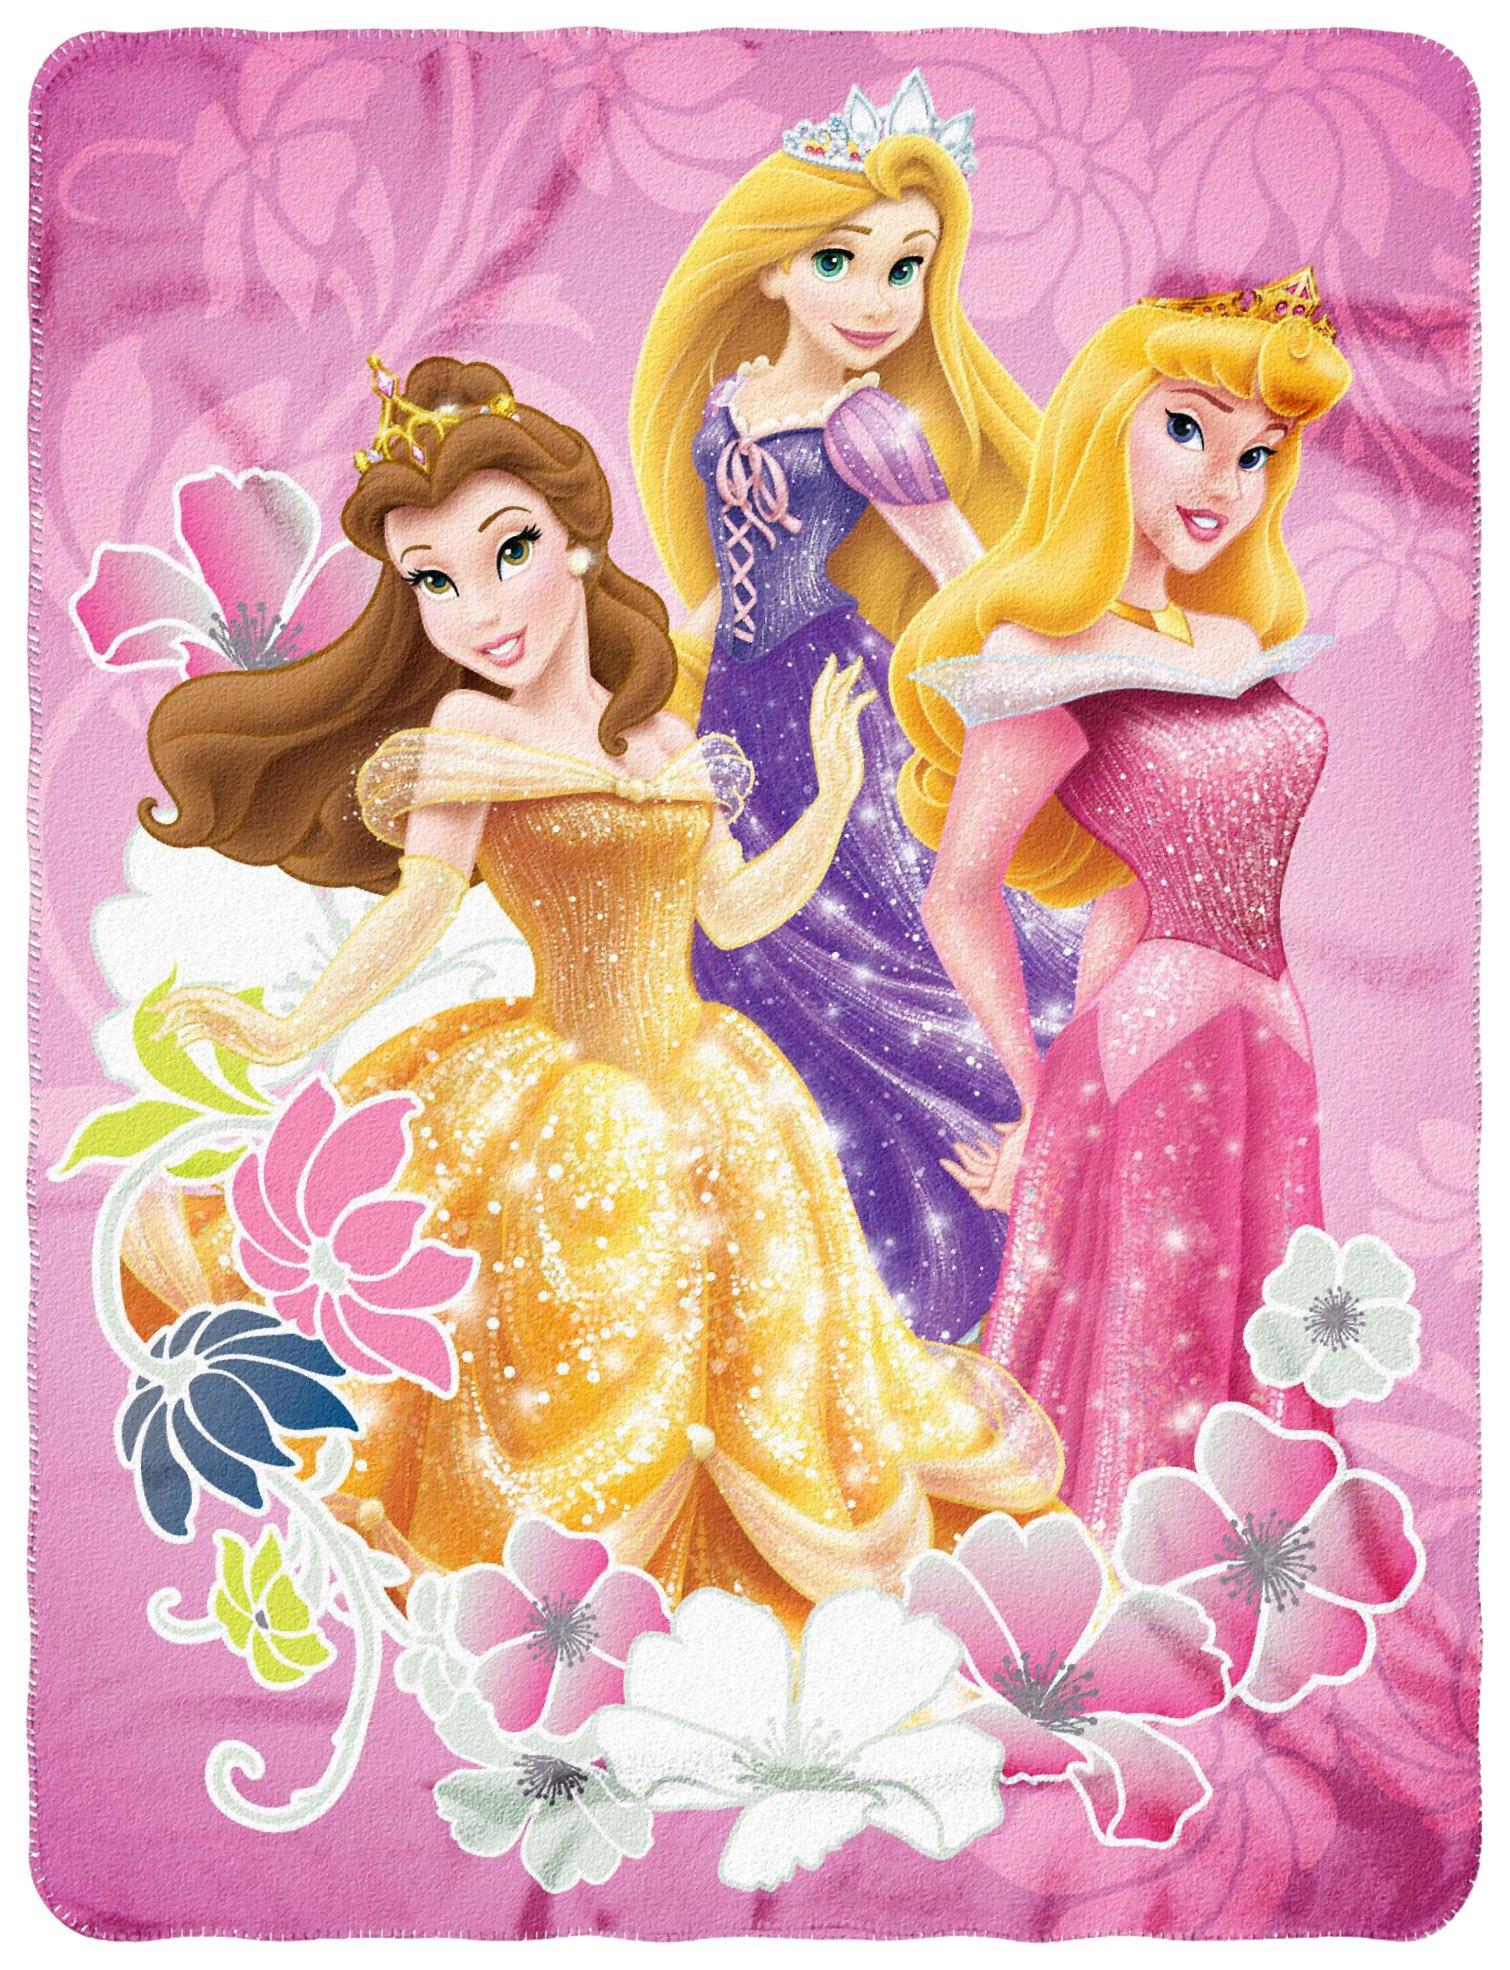 "Disney Princesses ""Shining Flowers"" Fleece Throw Blanket by The Northwest Company, 45"" x 60"""